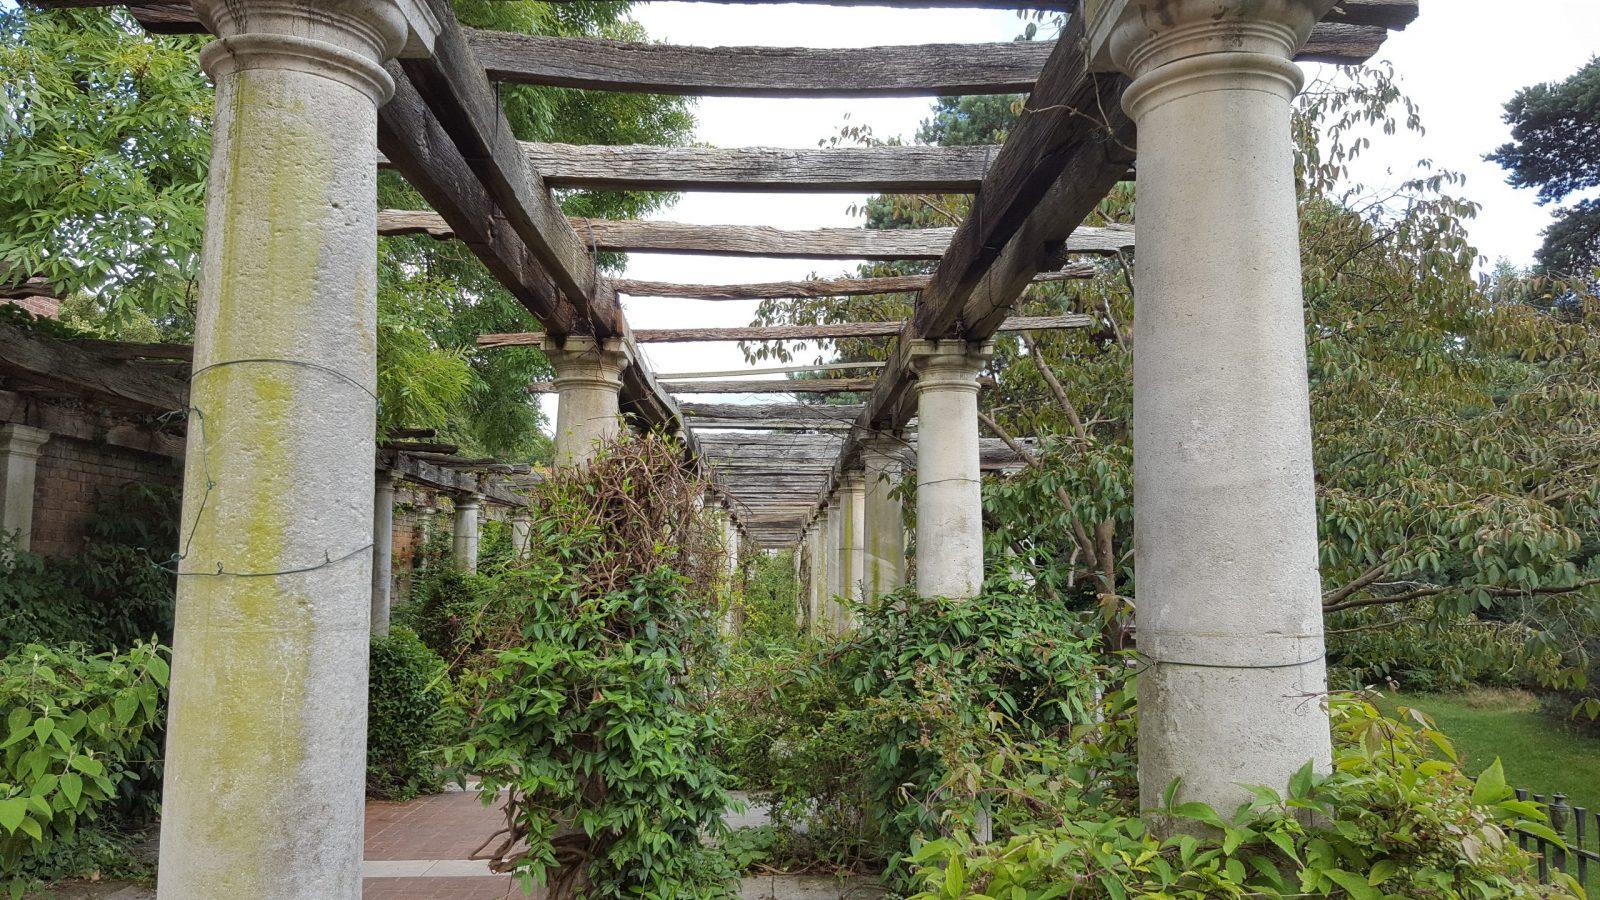 Visiting Hill Garden & Pergola, Hampstead Heath: Photo Gallery 3